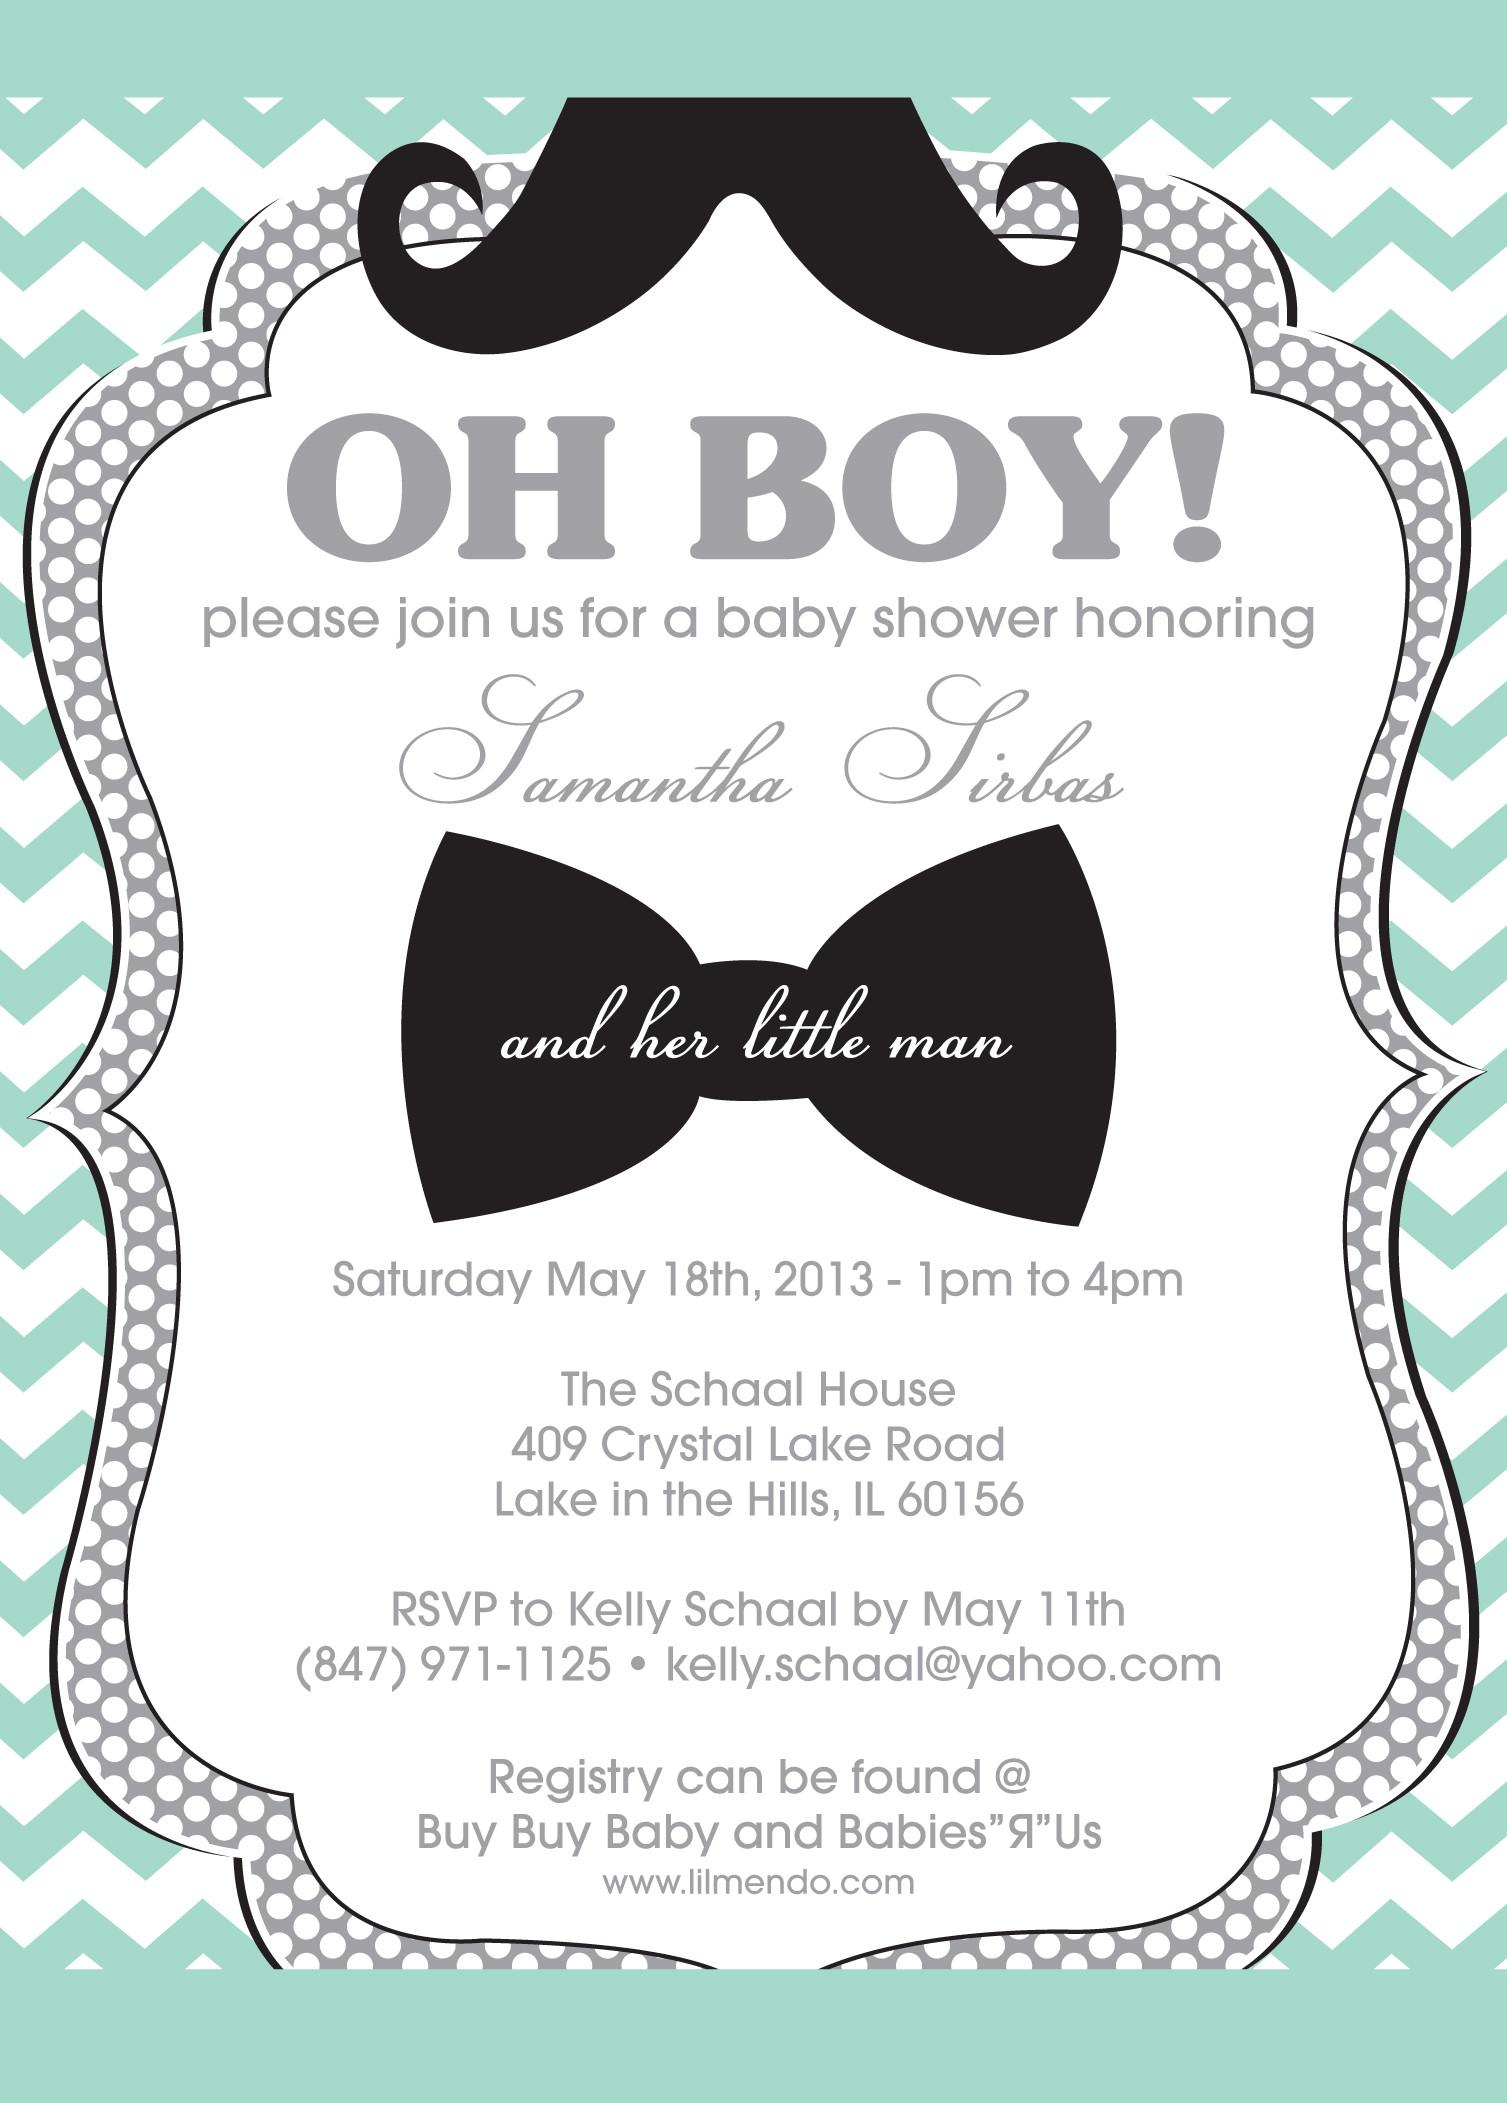 Baby Shower Gift List Ideas  Baby Shower Needs Checklist Image